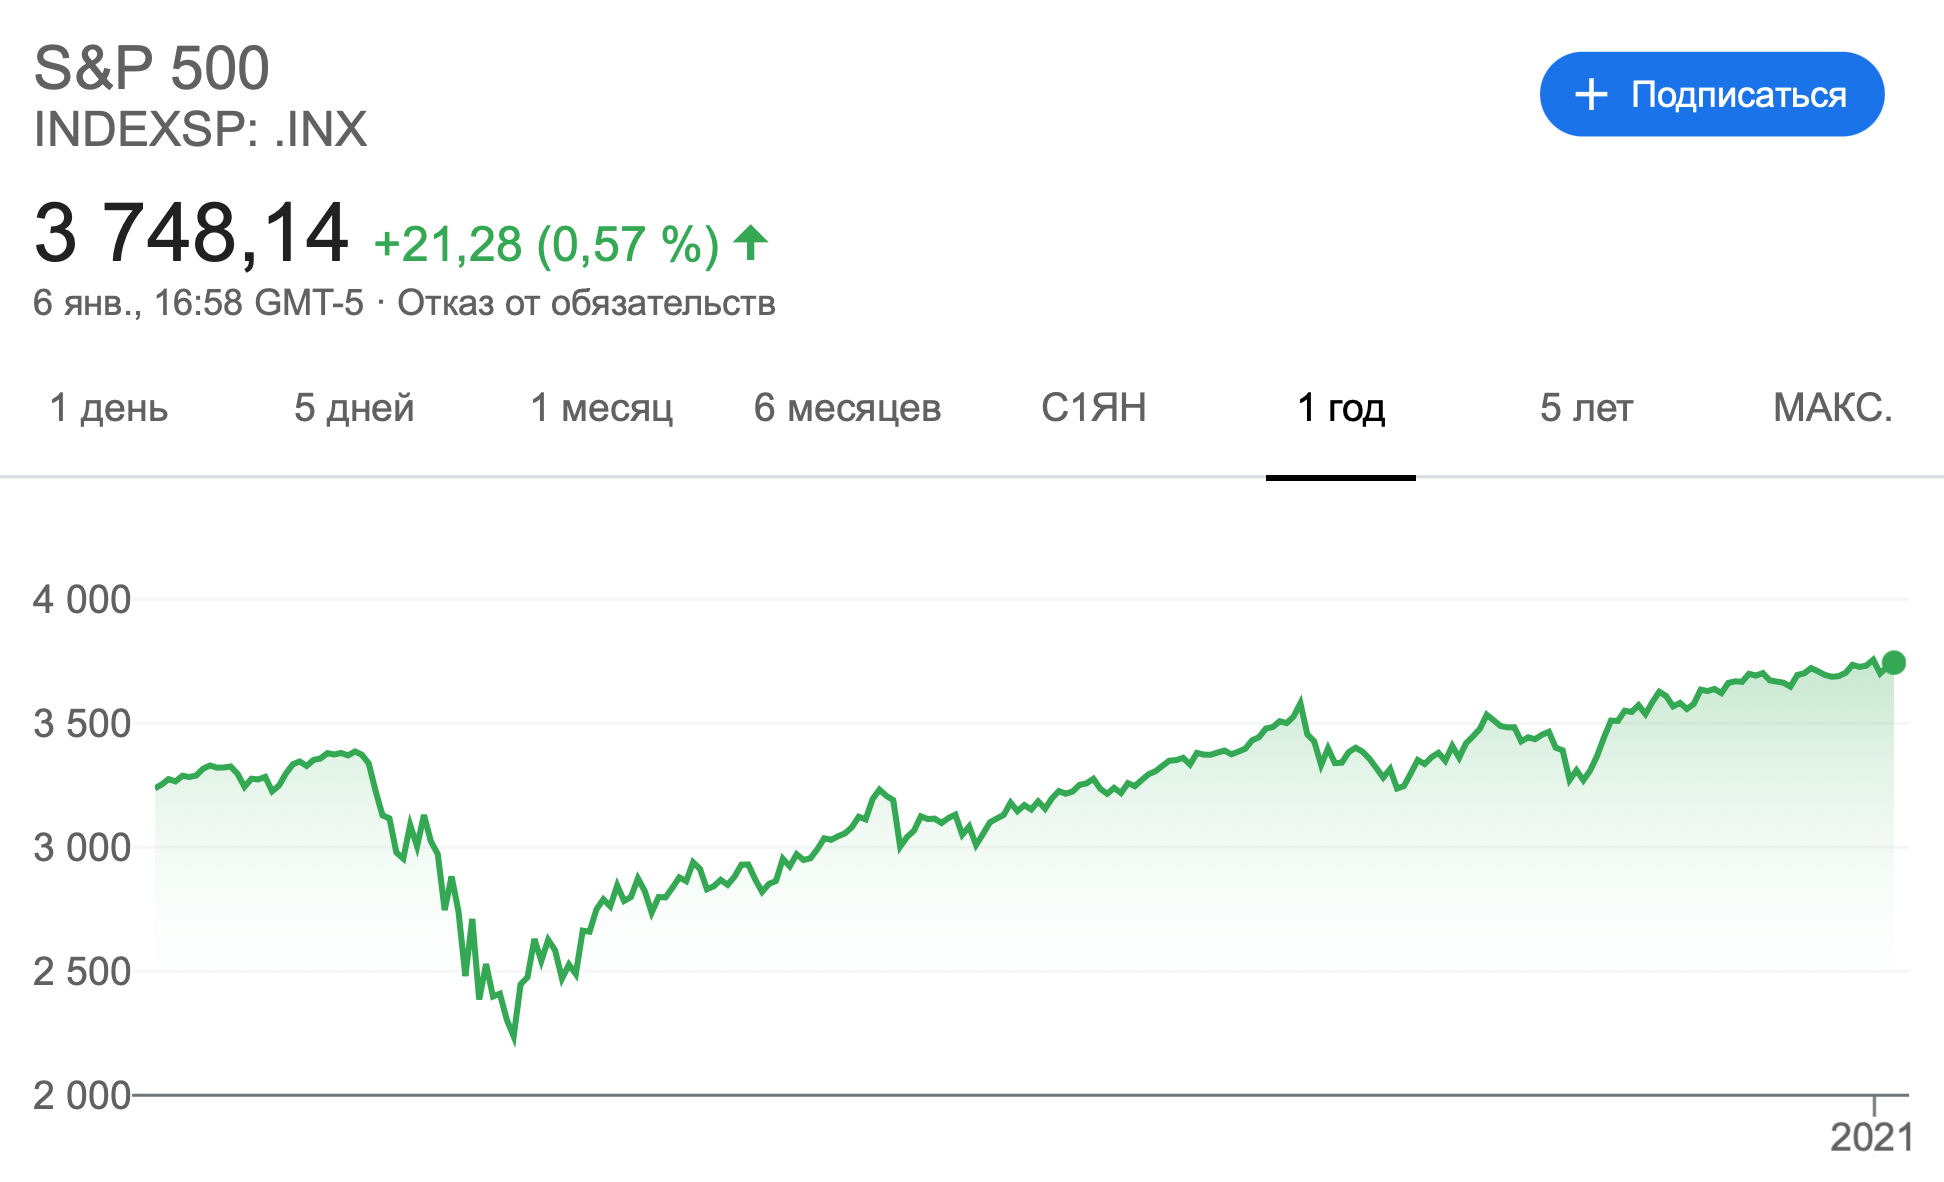 Поведение индекса S&P500